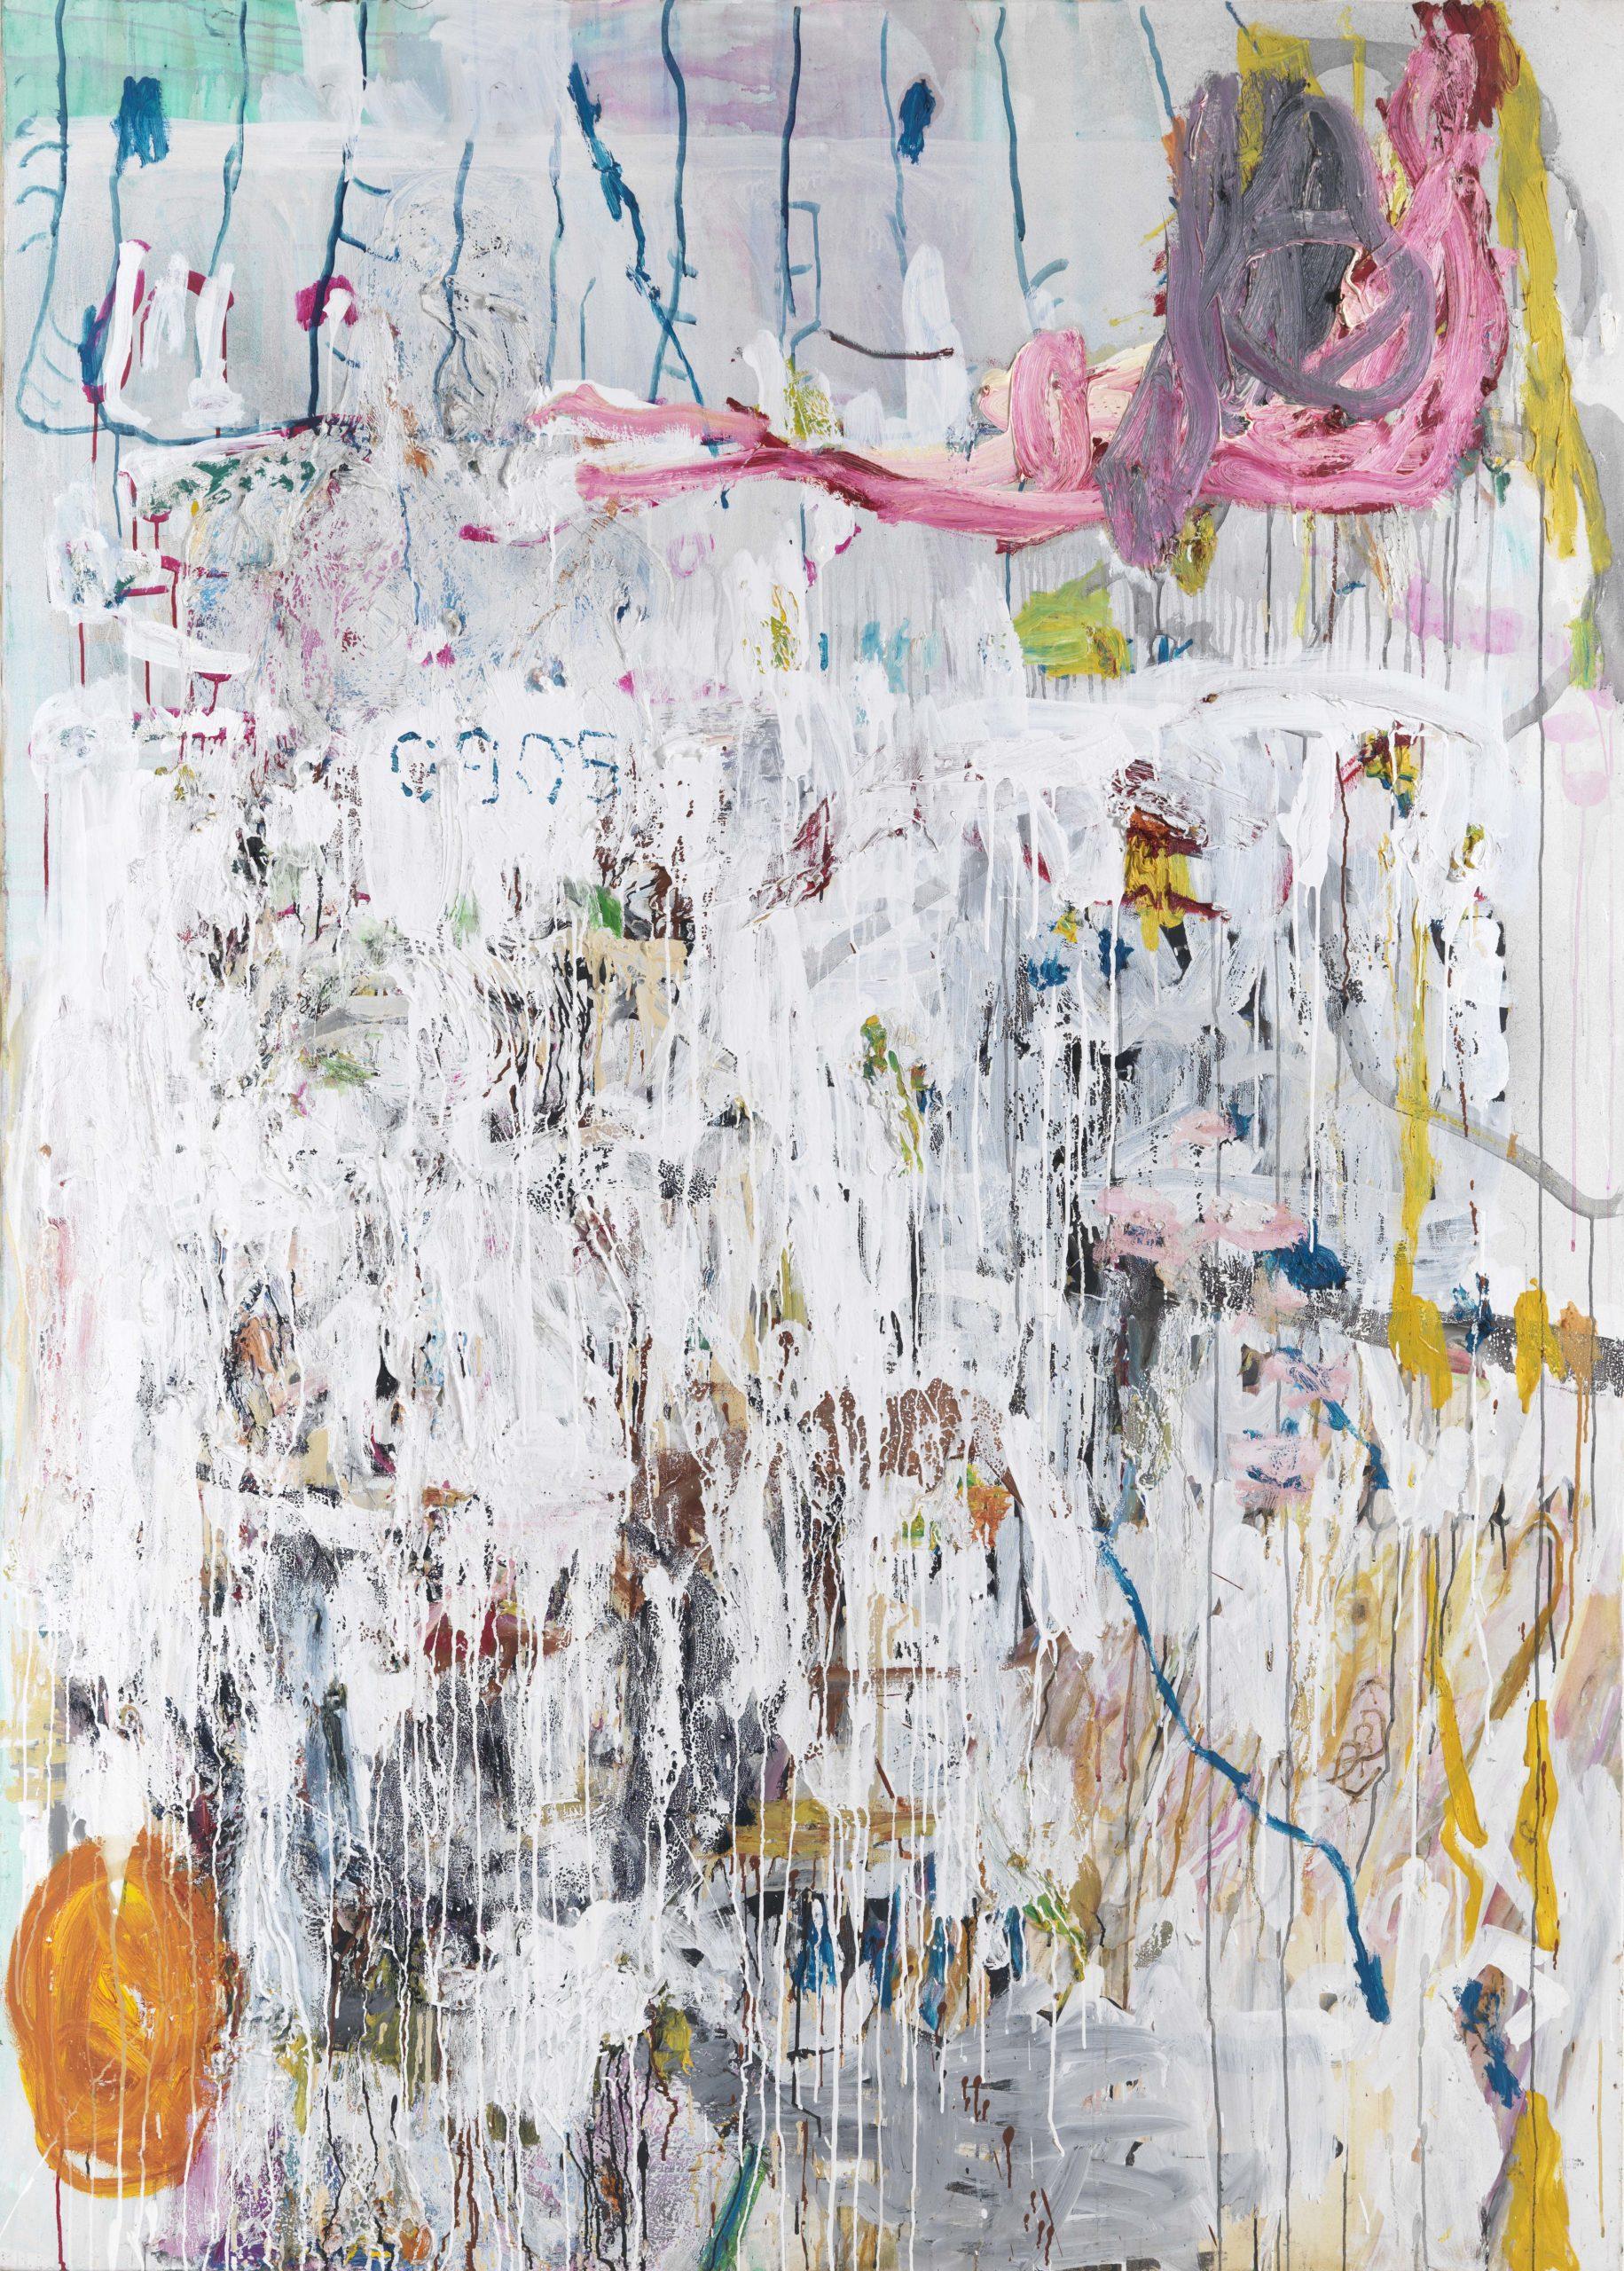 Reinhard Pods, Untitled, 2005, oil on canvas, 230.6 x 164.8 cm